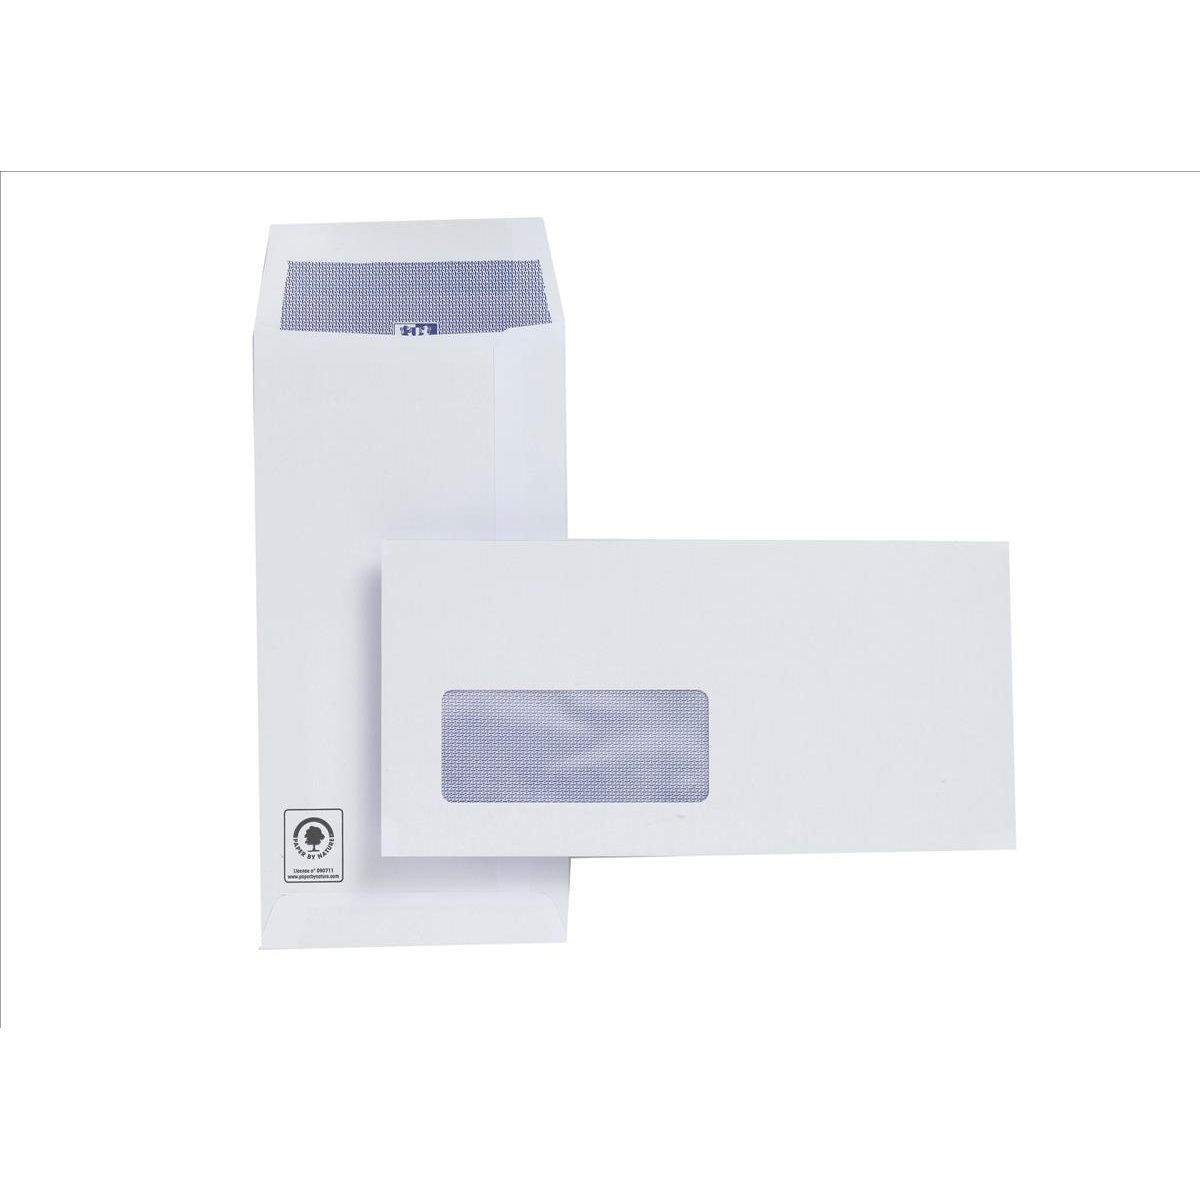 Plus Fabric Envelopes PEFC Pocket Peel and Seal Window 120gsm DL 220x110mm White Ref J26671 Pack 500